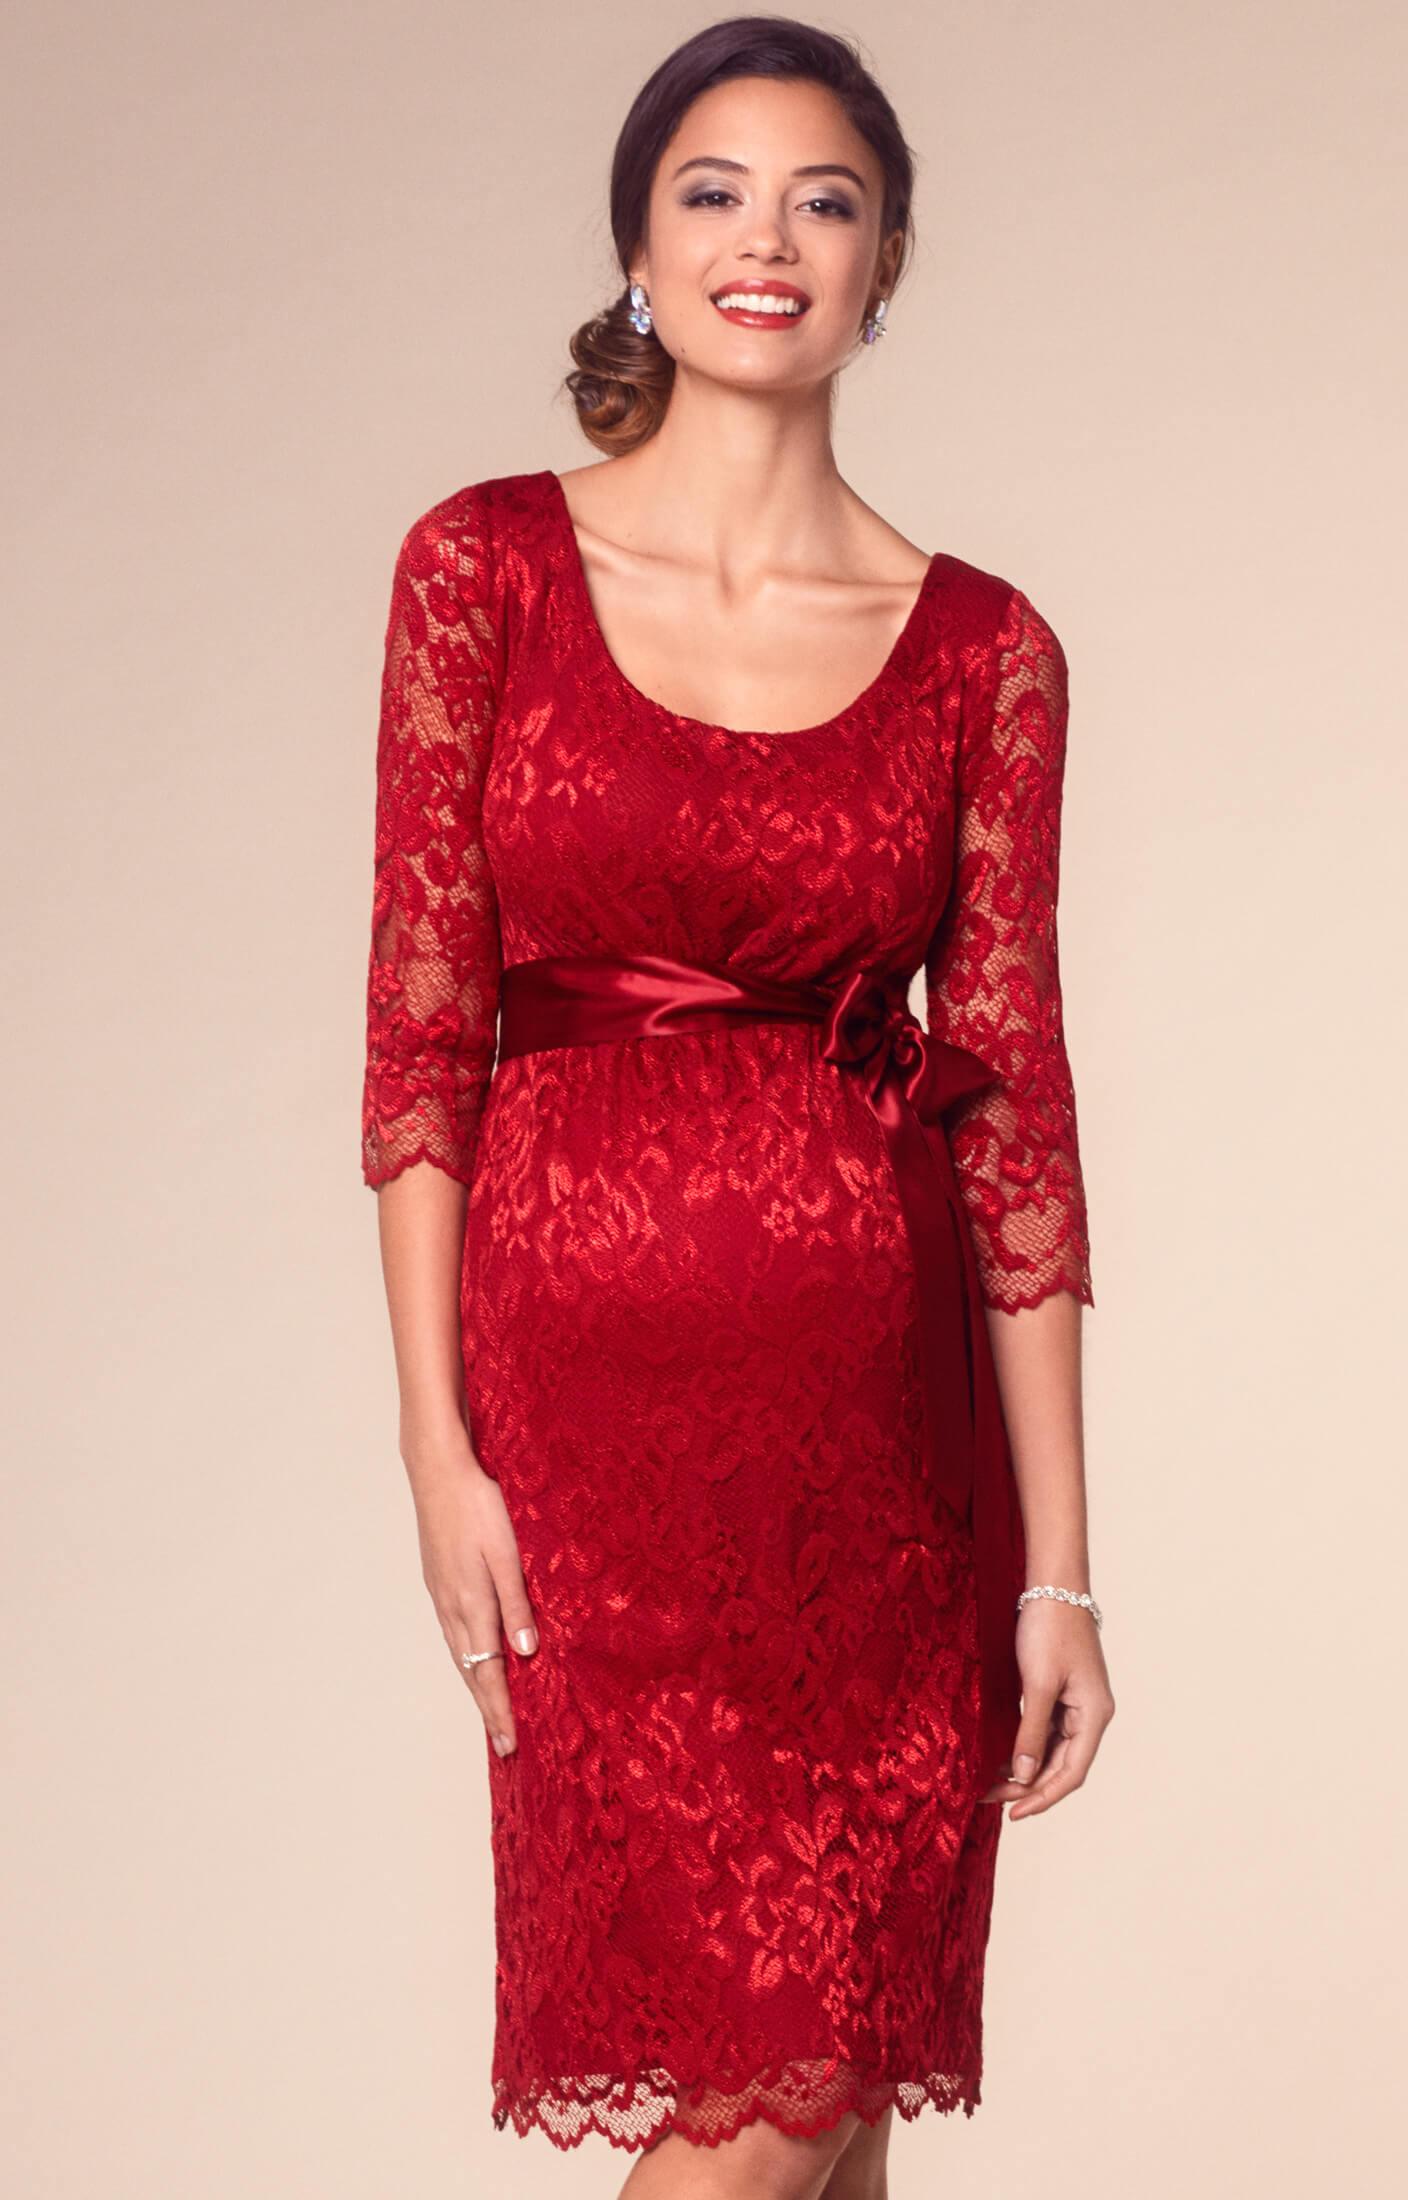 Katie Maternity Dress Short Rouge - Brudklänningar 28c2d5191f51d